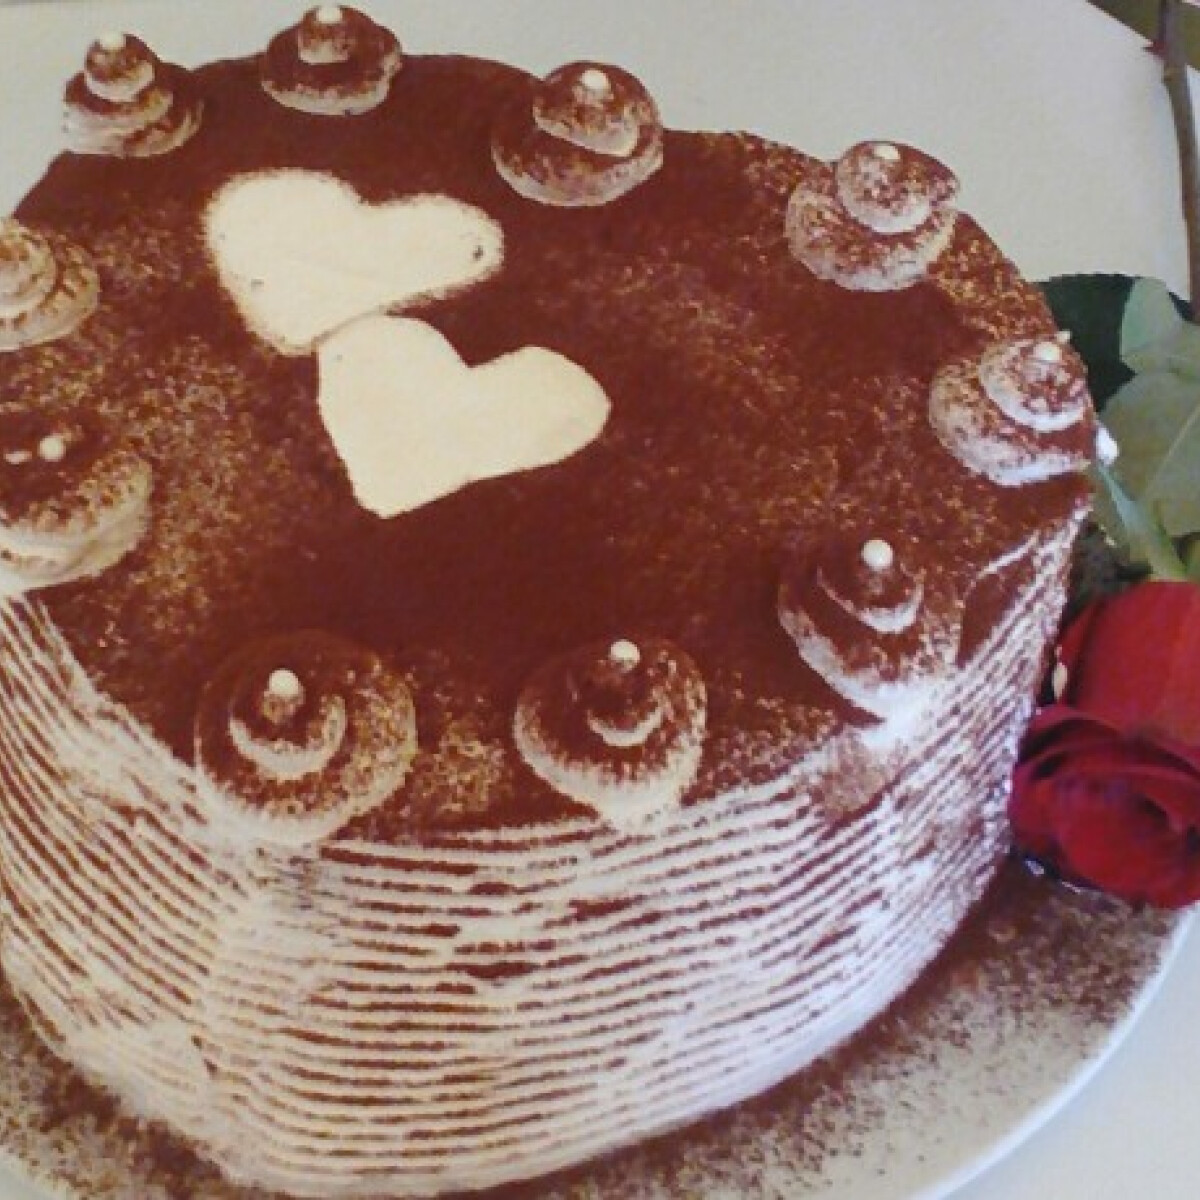 Szerelmes tiramisu torta